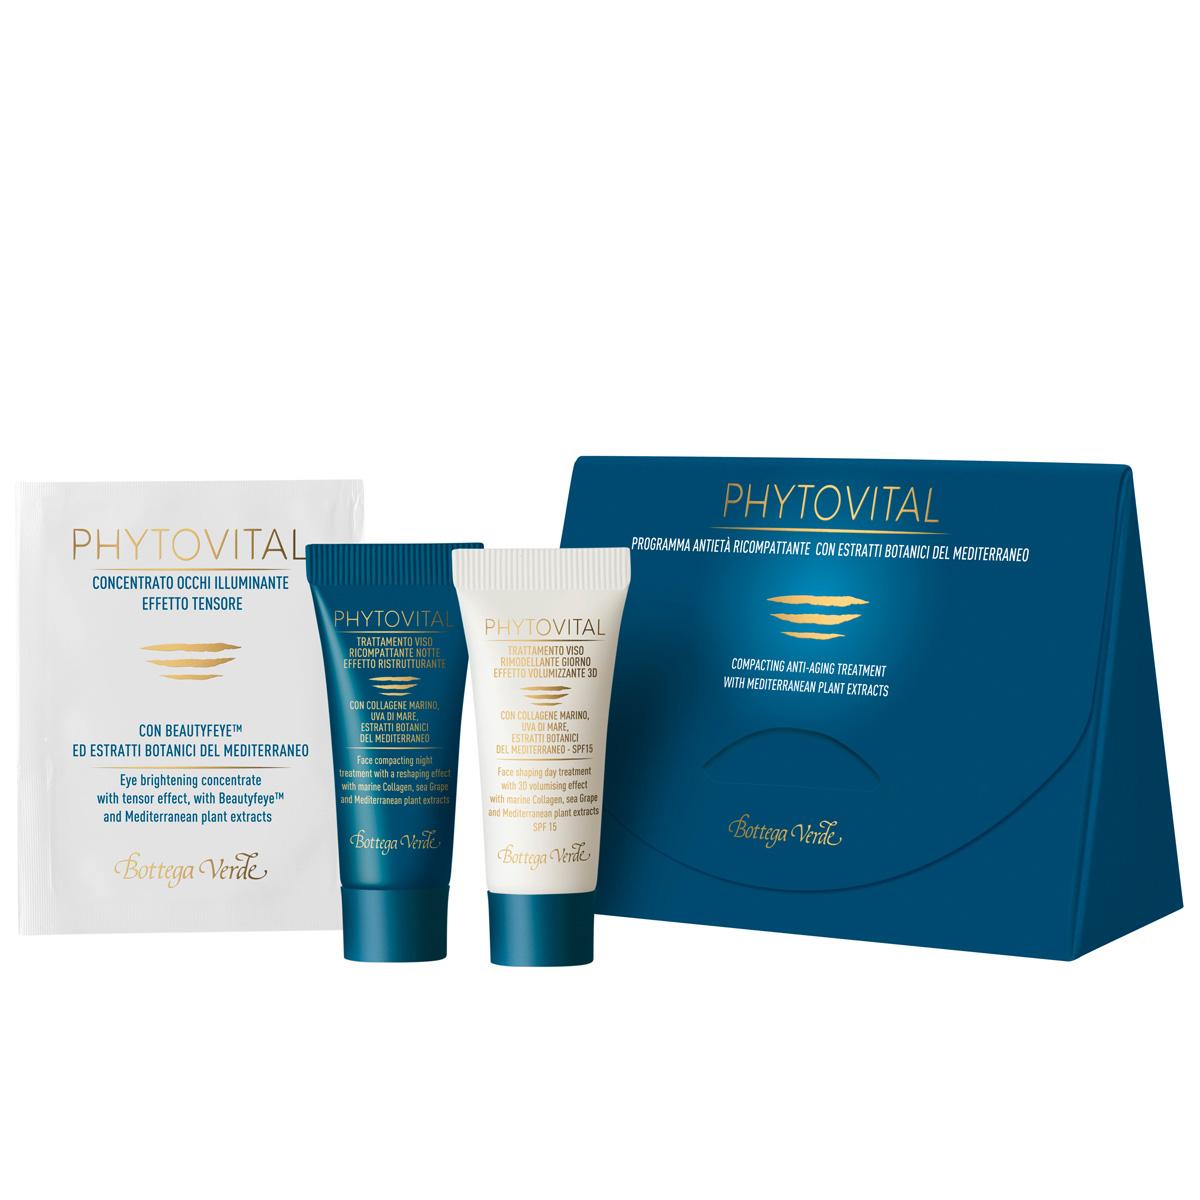 Set cadou - Tratament anti-aging cu extracte din plante mediteraneene Phytovital - Phytovital, 5 ML